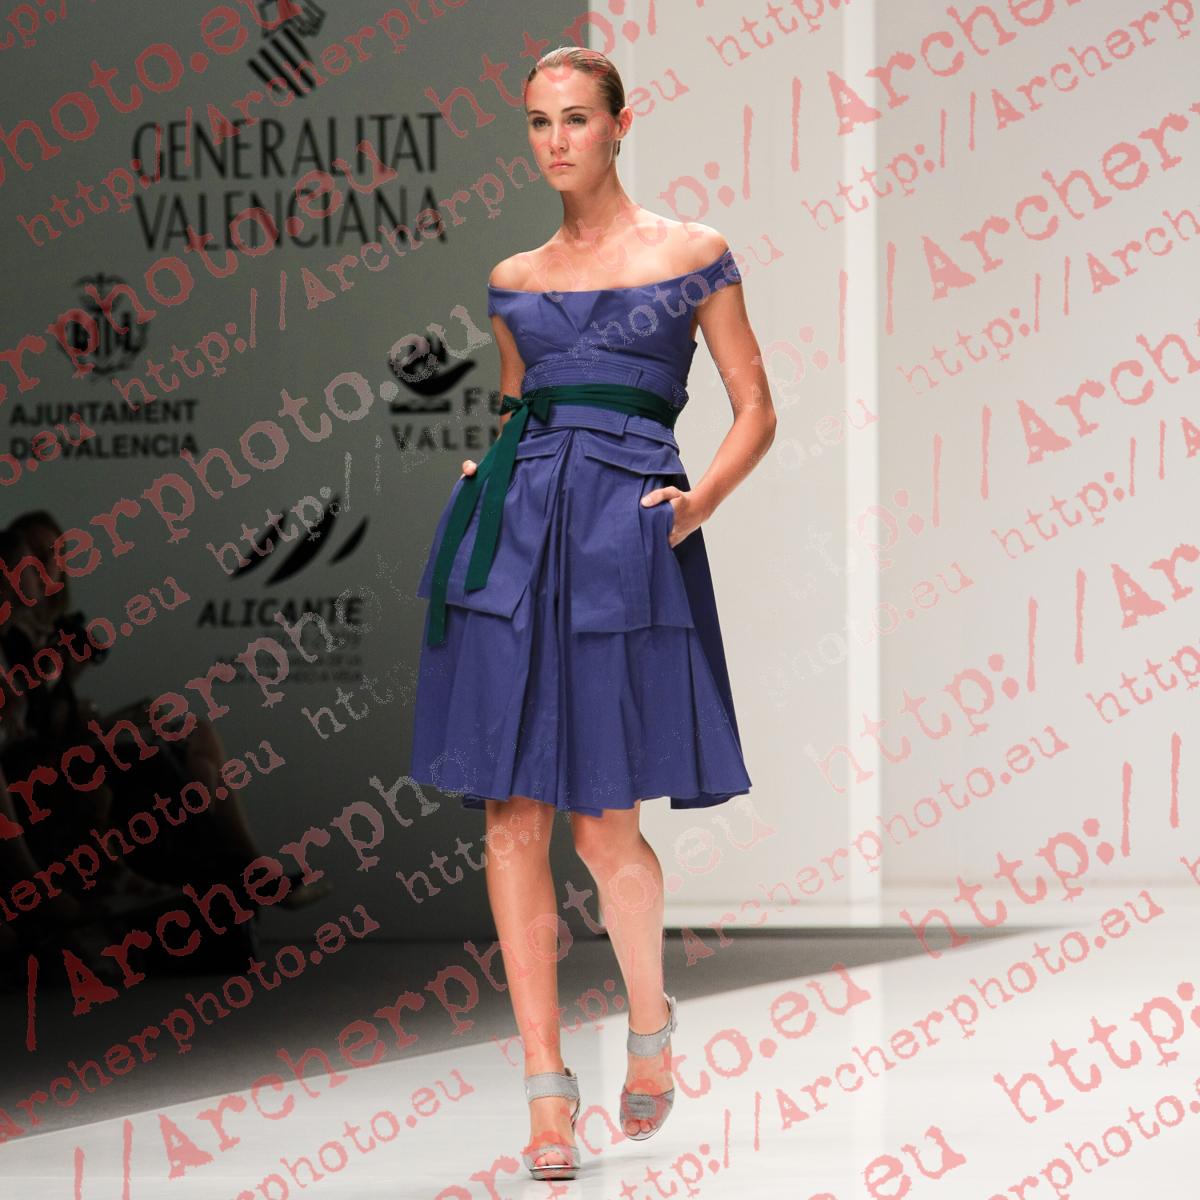 Elena Santamatilde in Ion Fiz, Valencia Fashion Week September 4th 2008